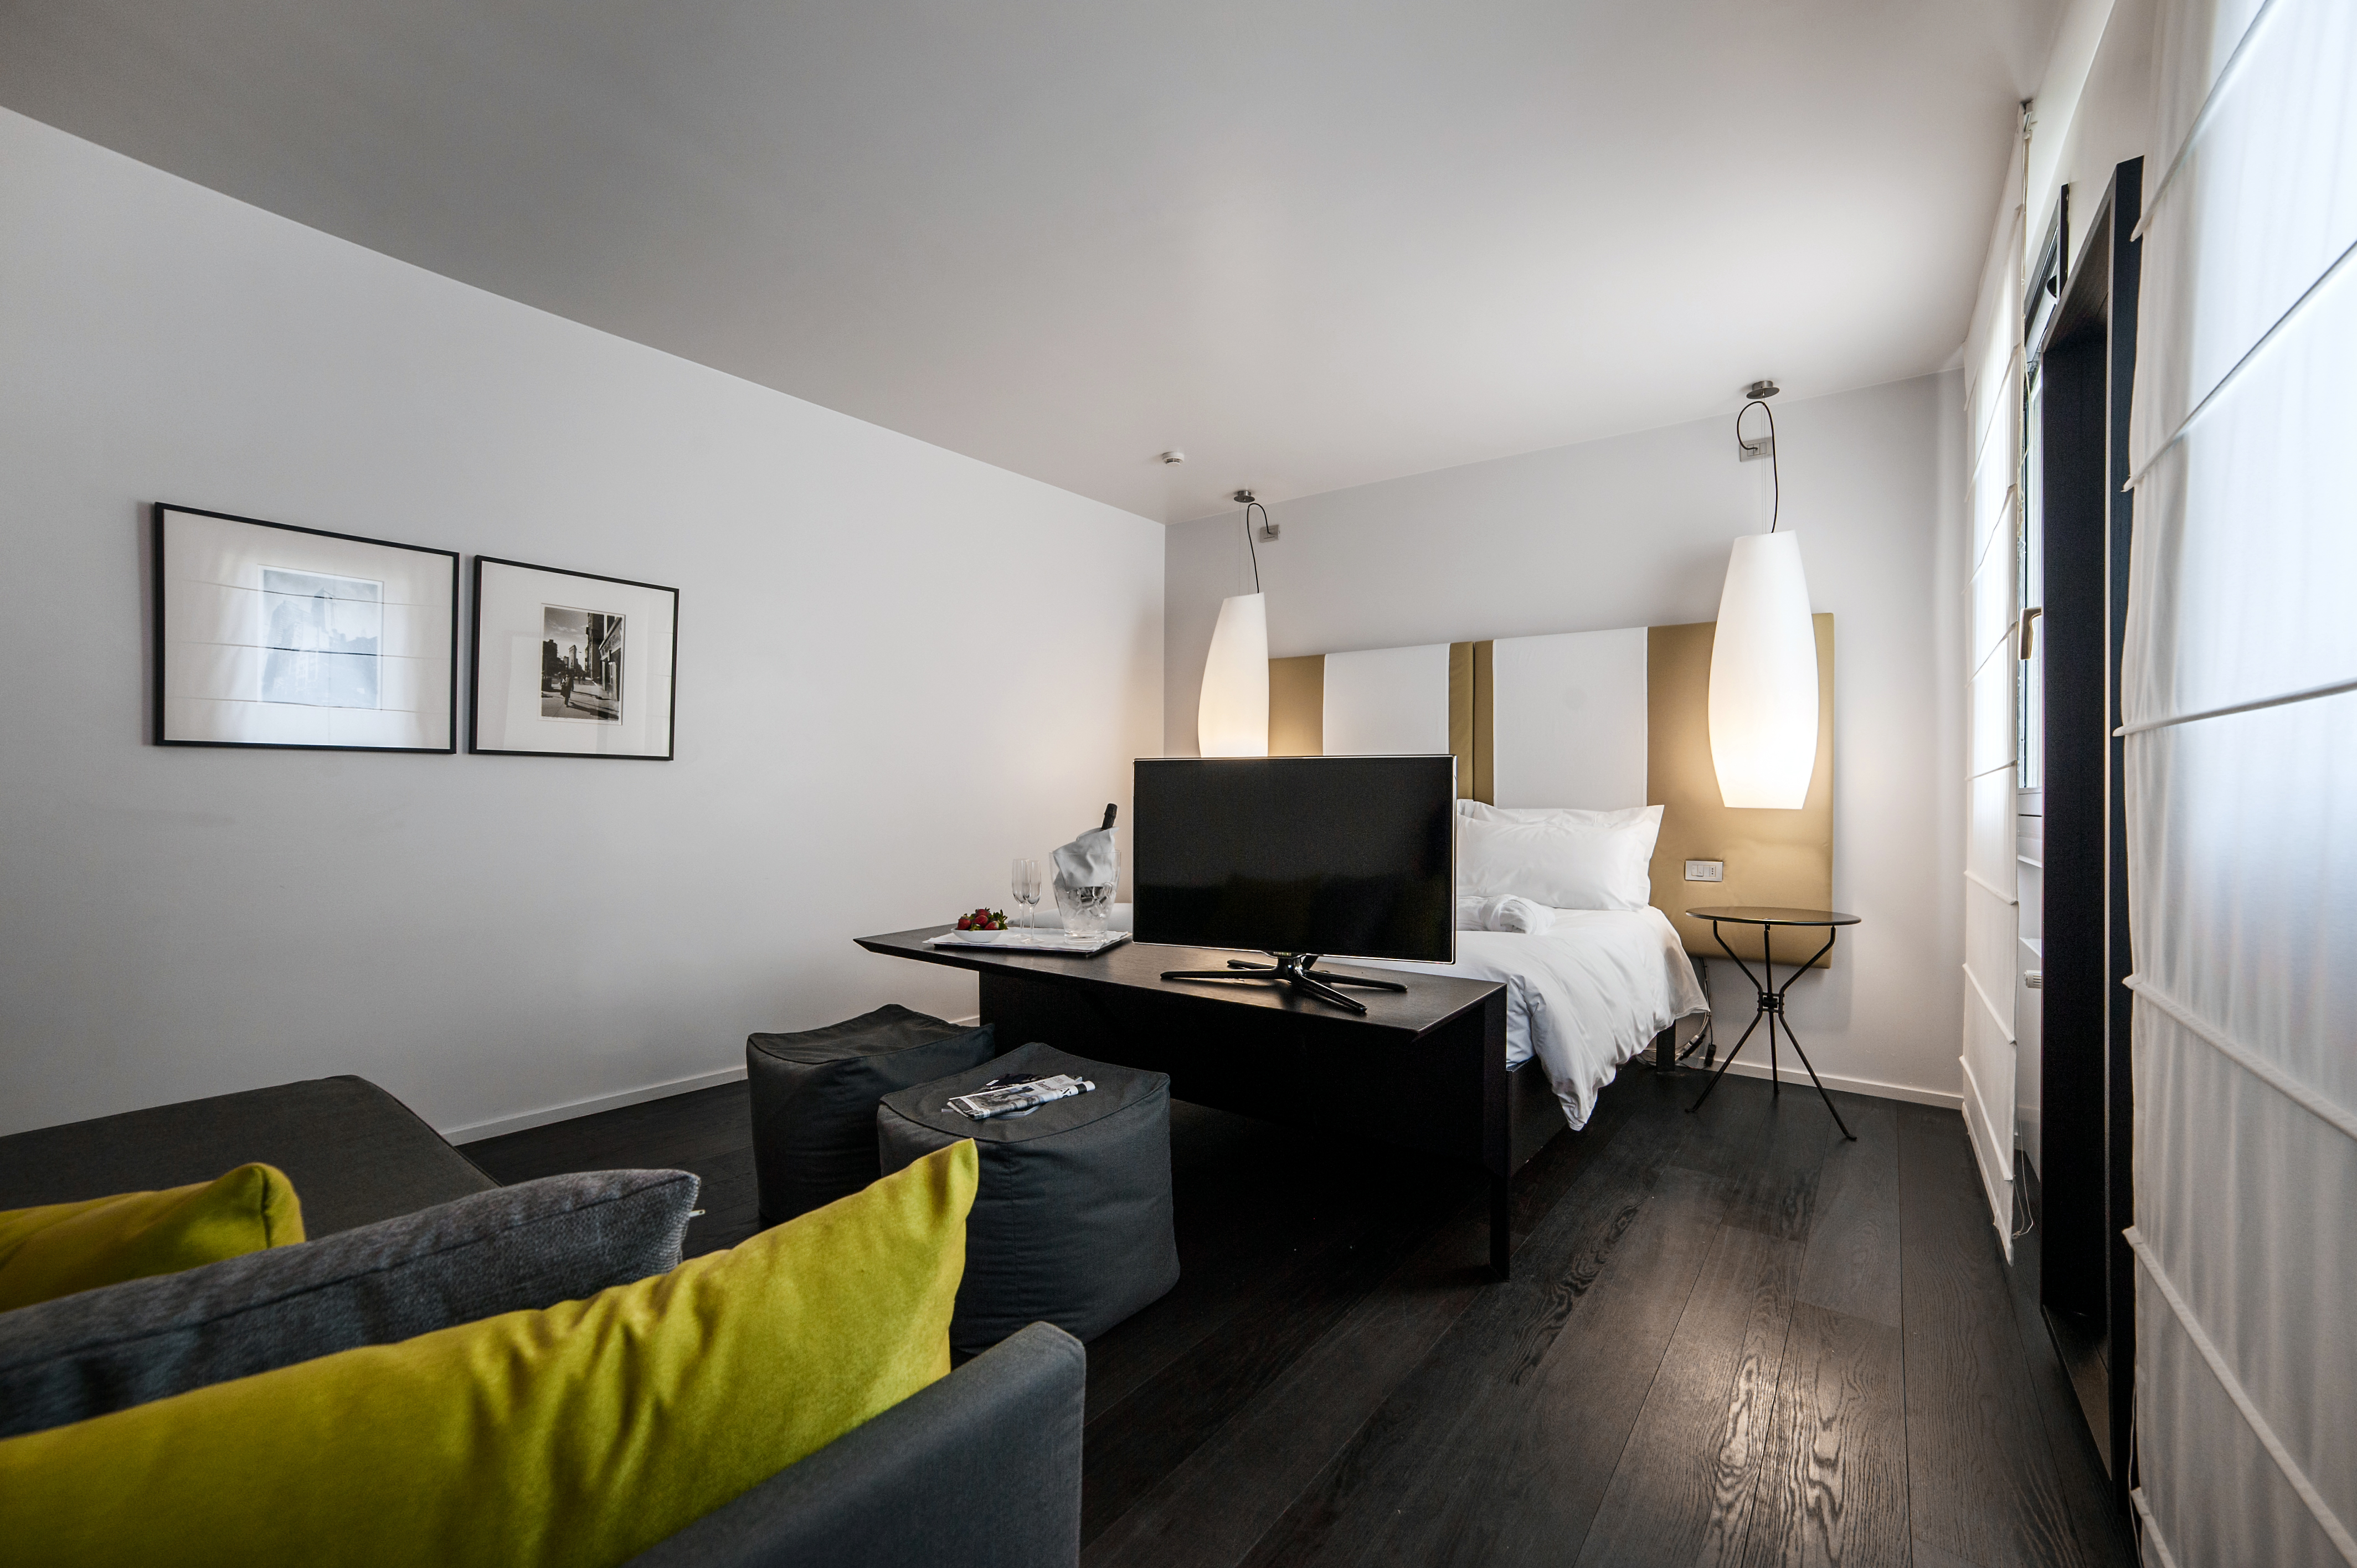 Hotel Casa Poli (Mantova) - 0042